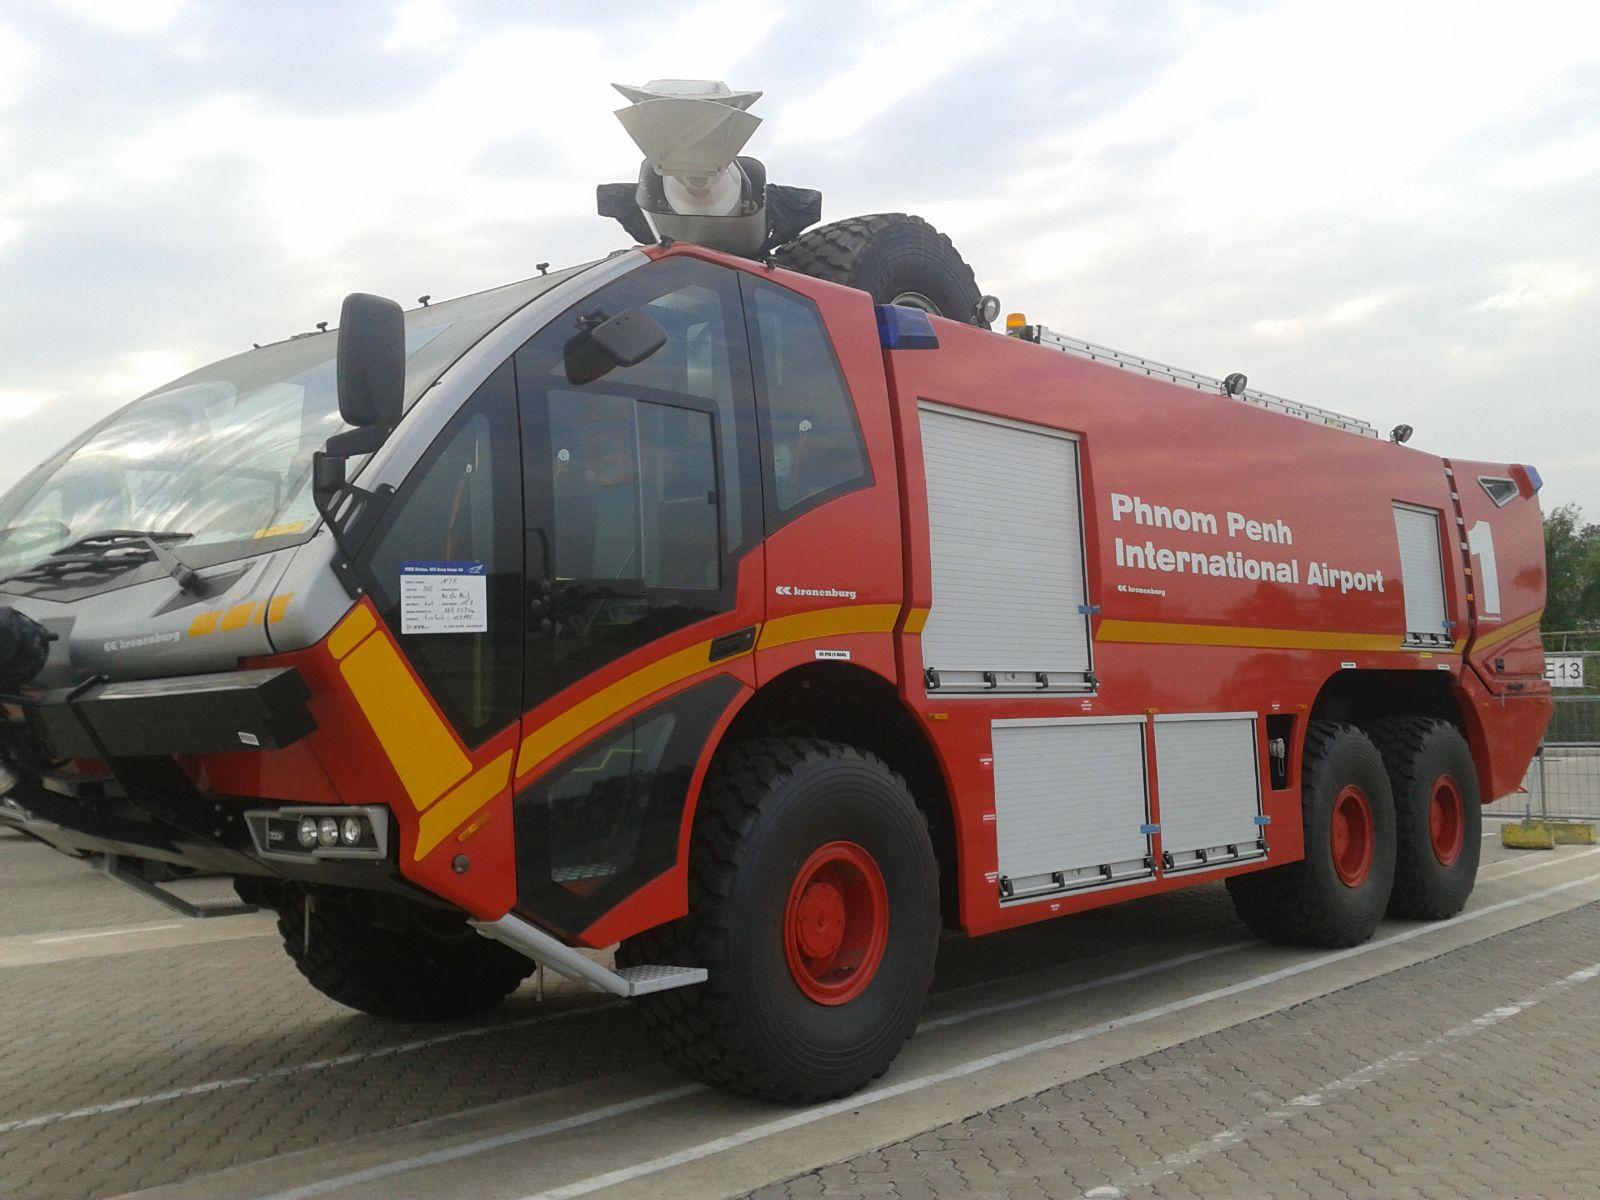 Xe cứu hỏa- xe cứu hỏa sân bay